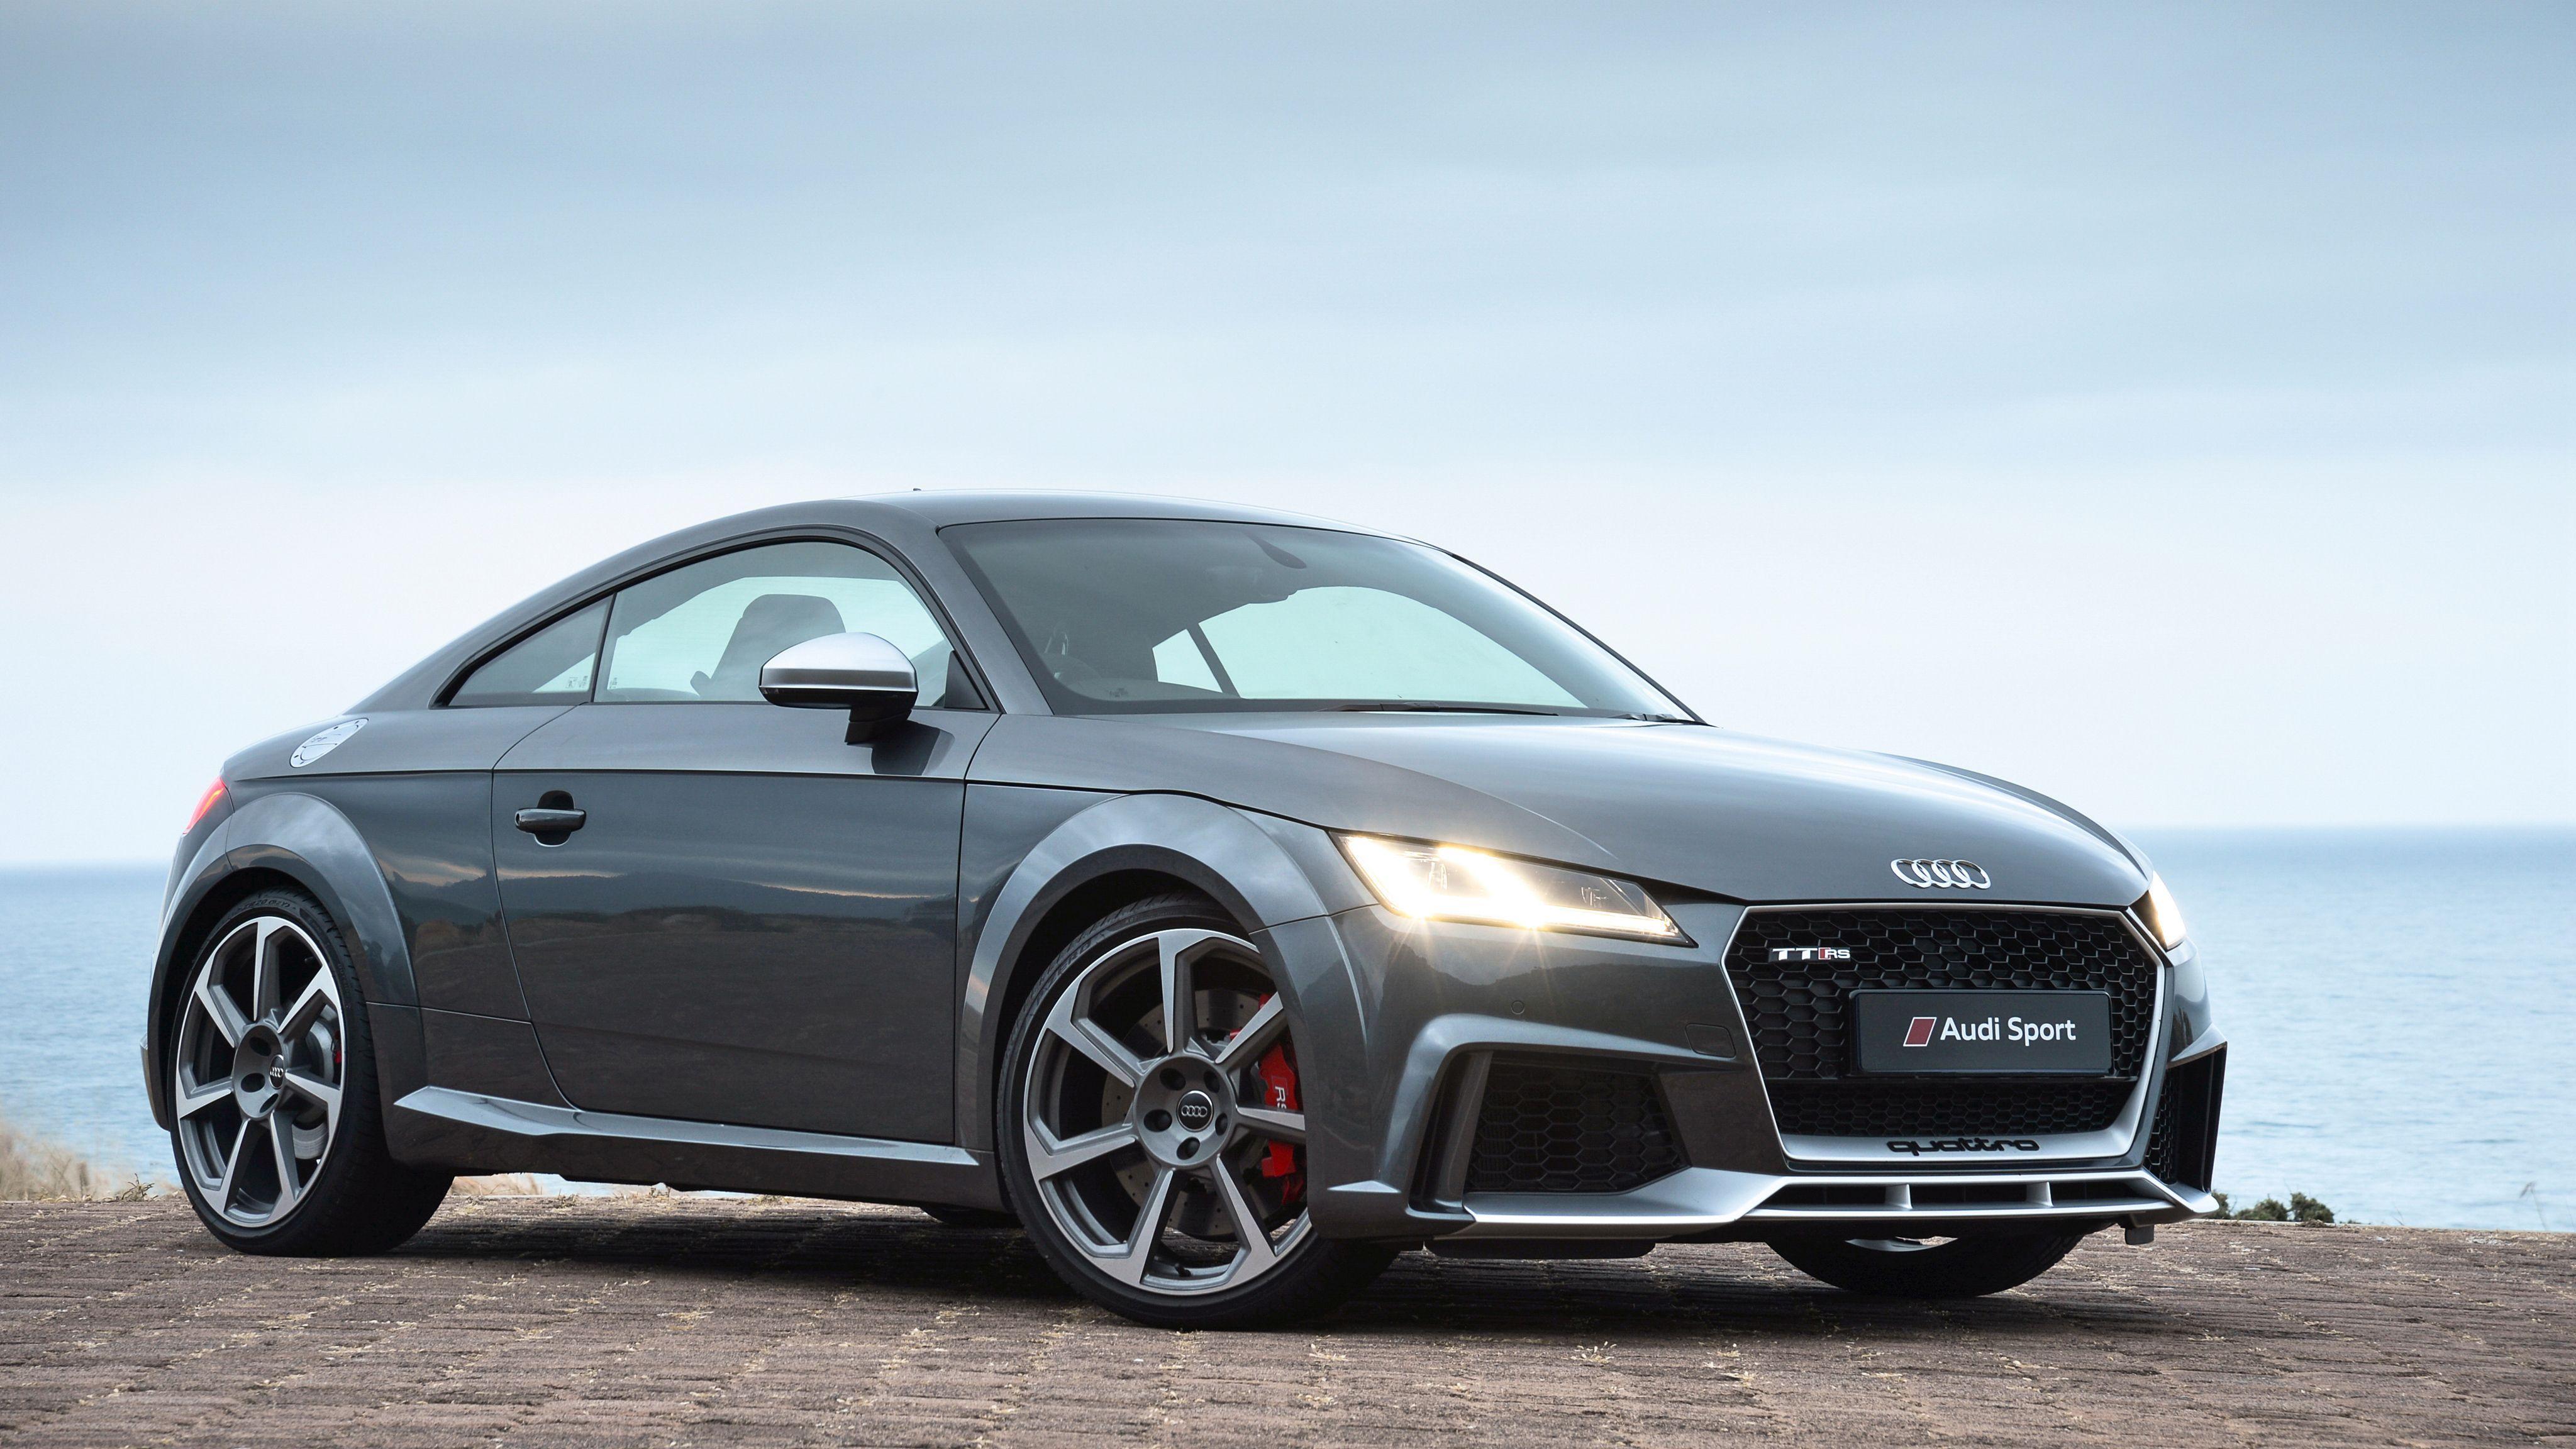 4k Audi Tt Wallpapers Top Free 4k Audi Tt Backgrounds